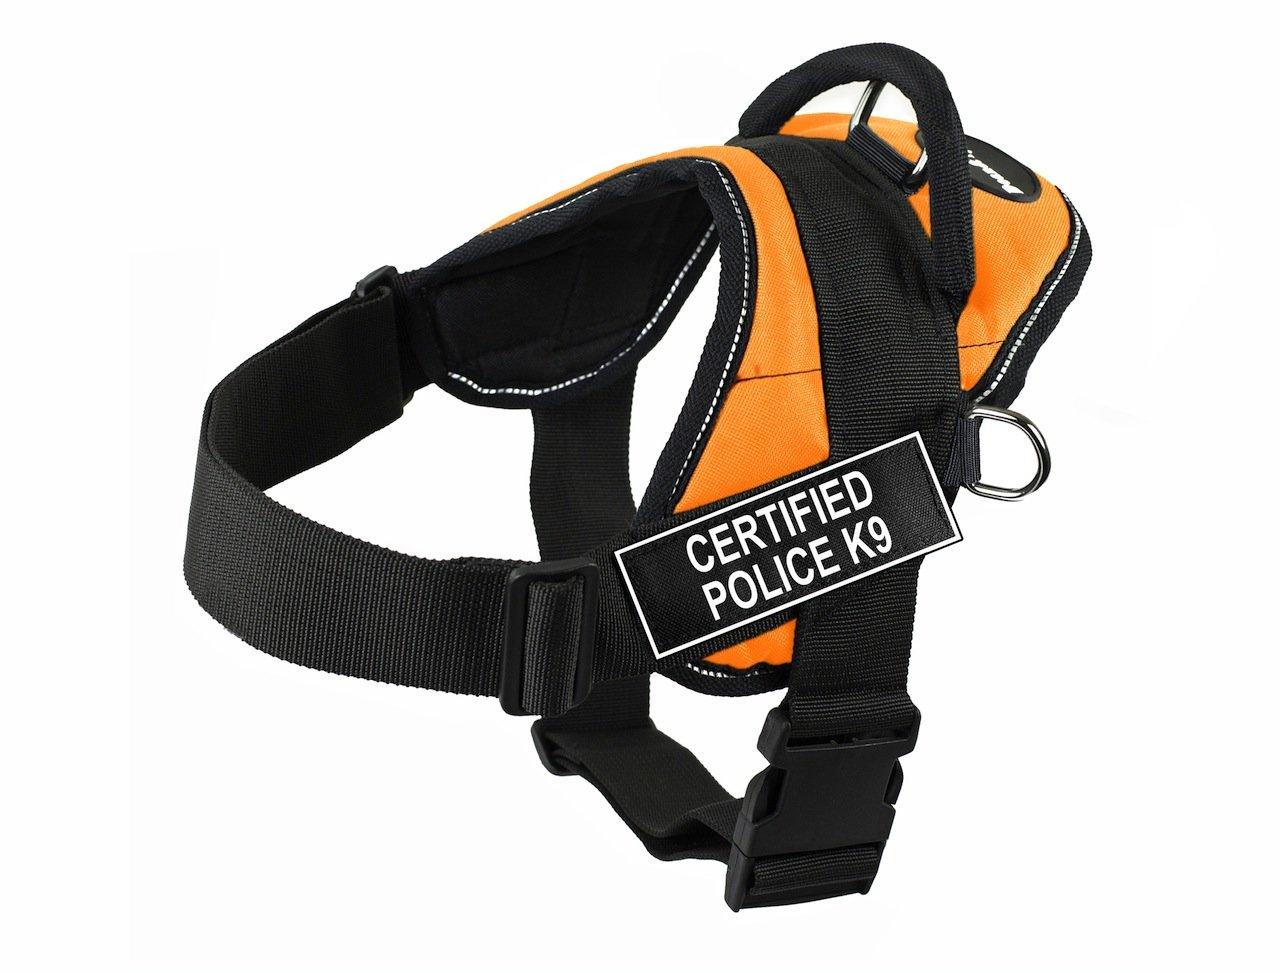 Dean & Tyler Fun Certified Police K9 XX-Small orange Harness with Reflective Trim